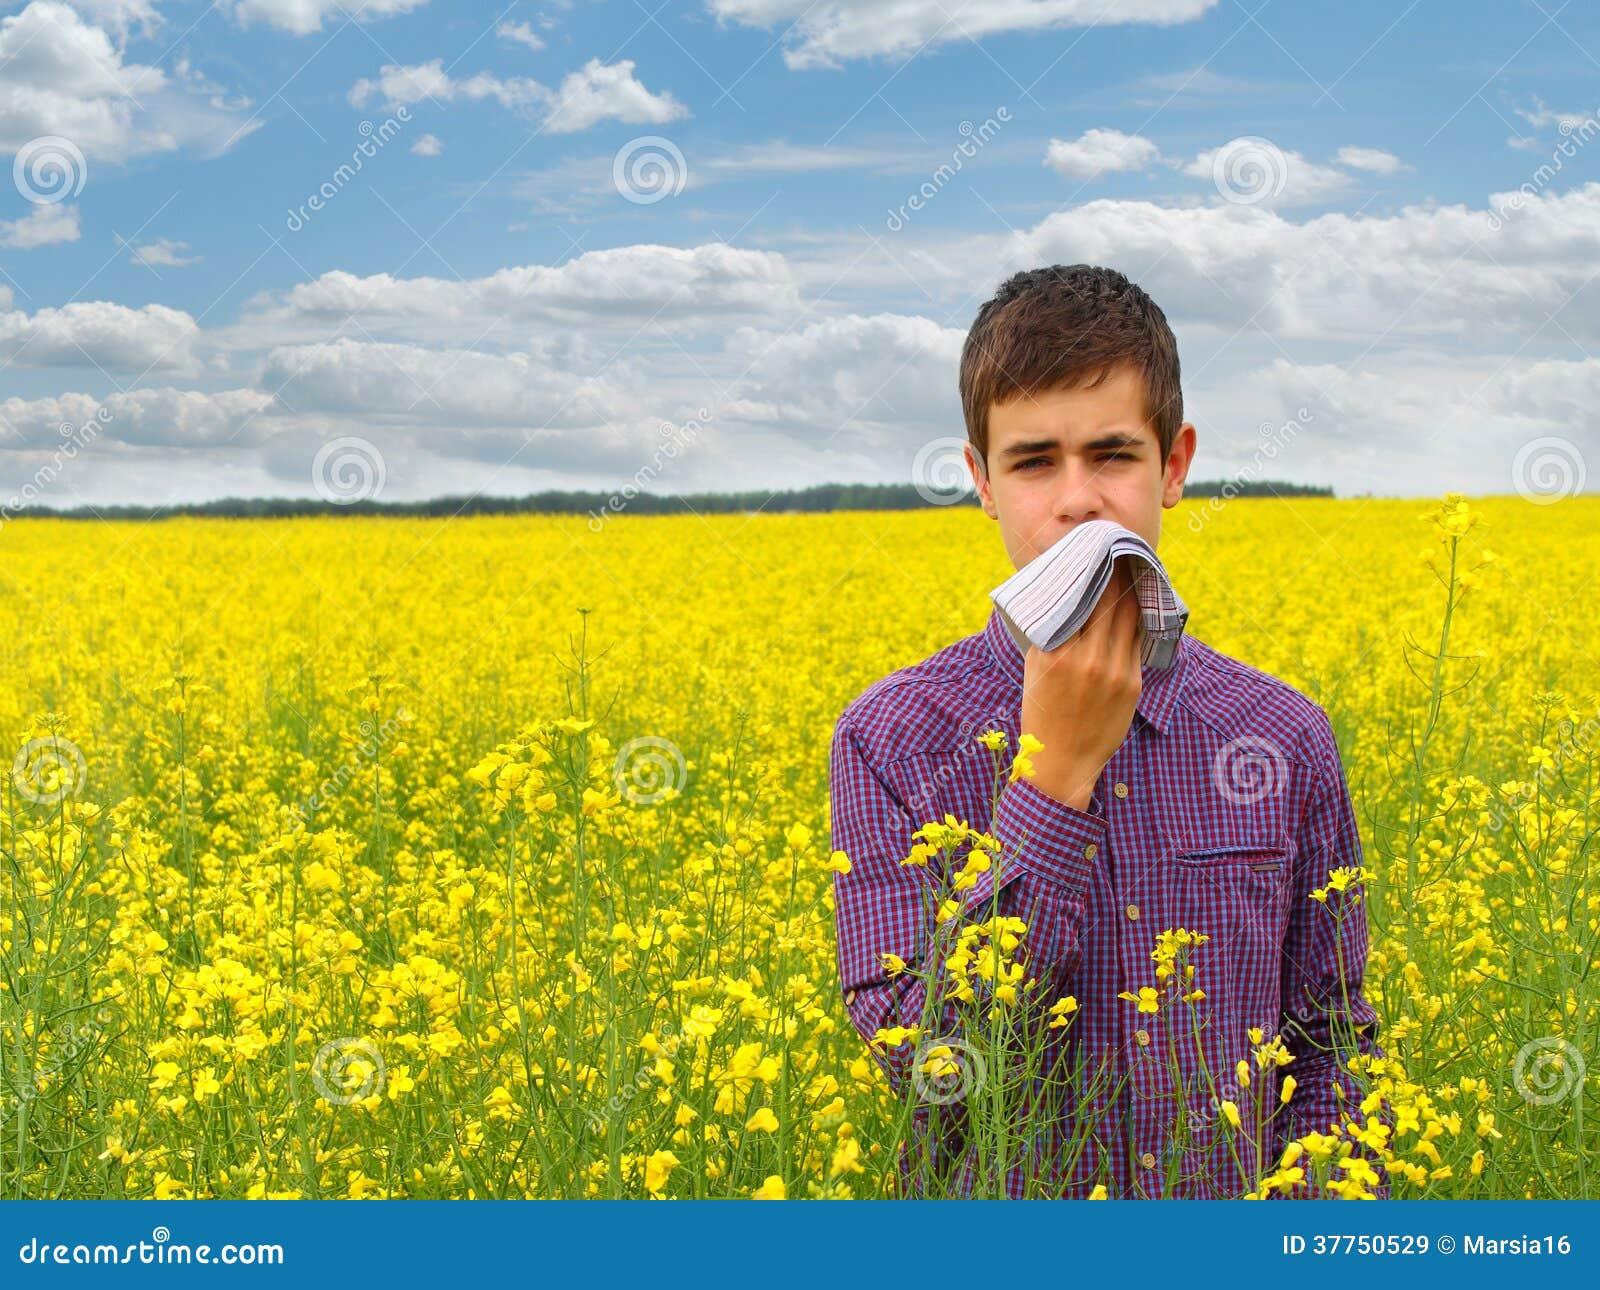 pollen ndlanya business plan